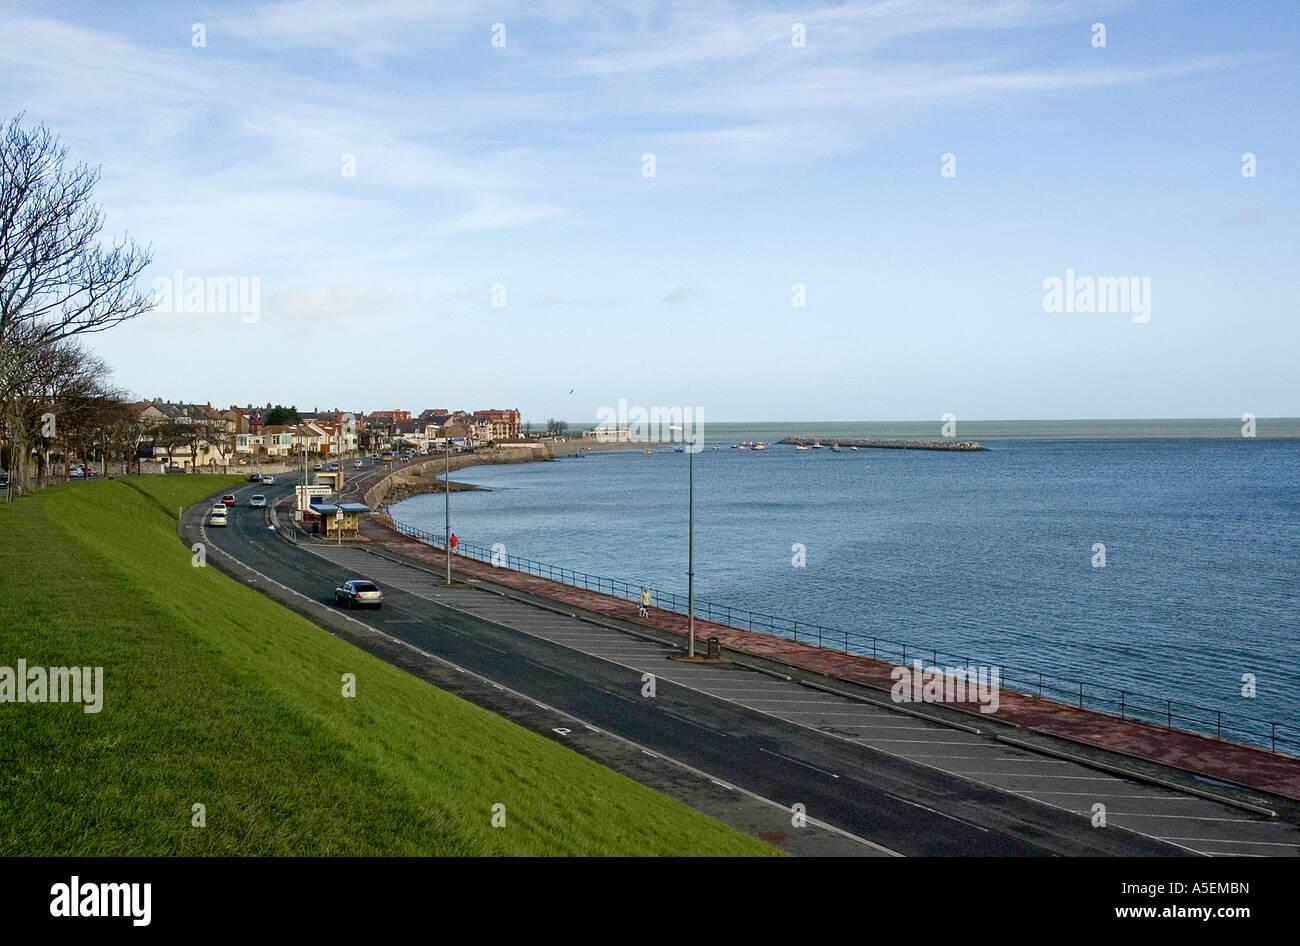 Promenade Colwyn Bay - Stock Image